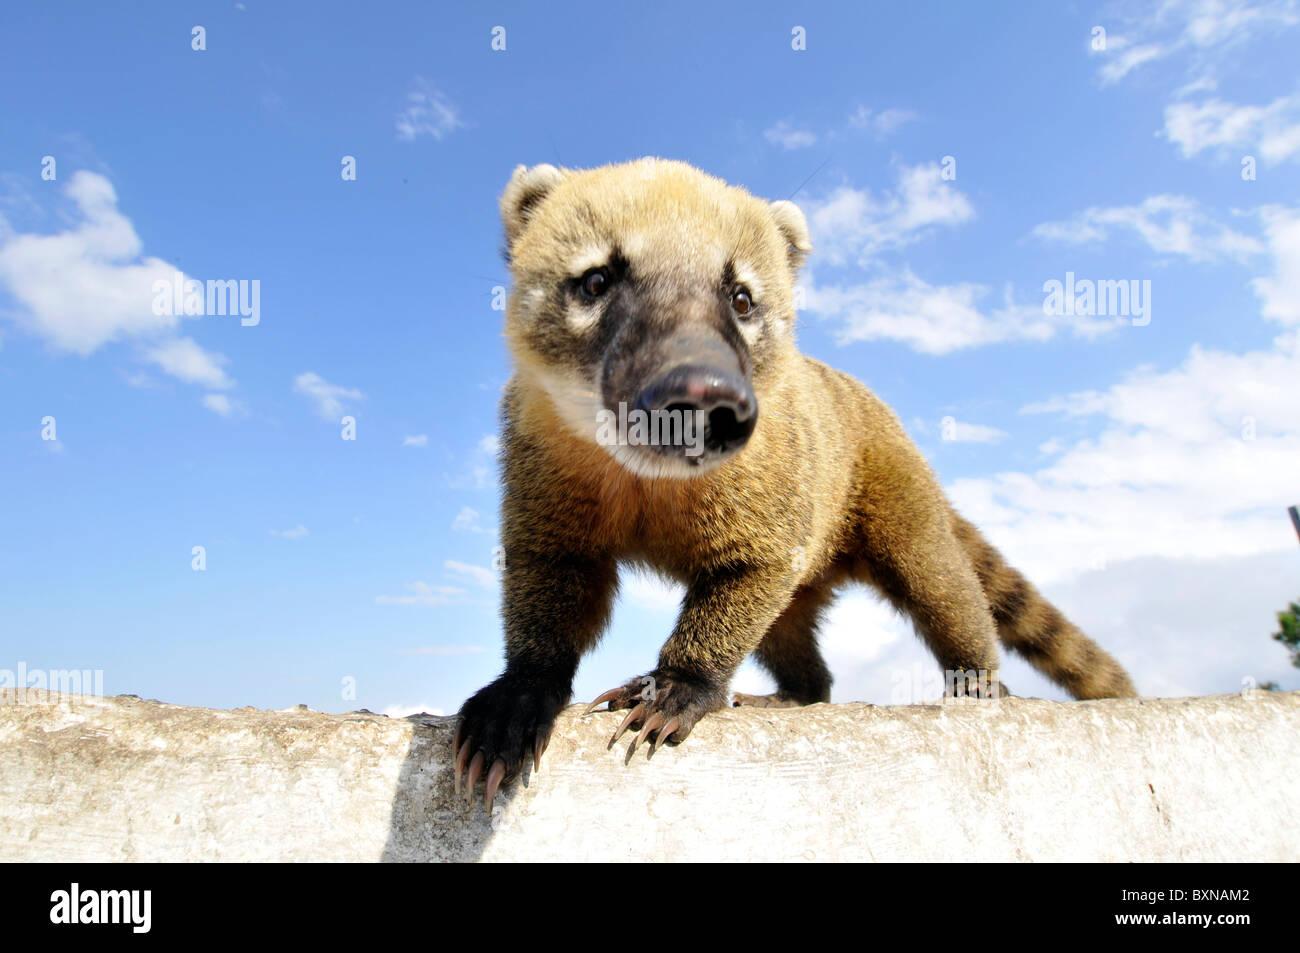 Wild coati, Nasua nasua, Santa Catarina, Brazil - Stock Image